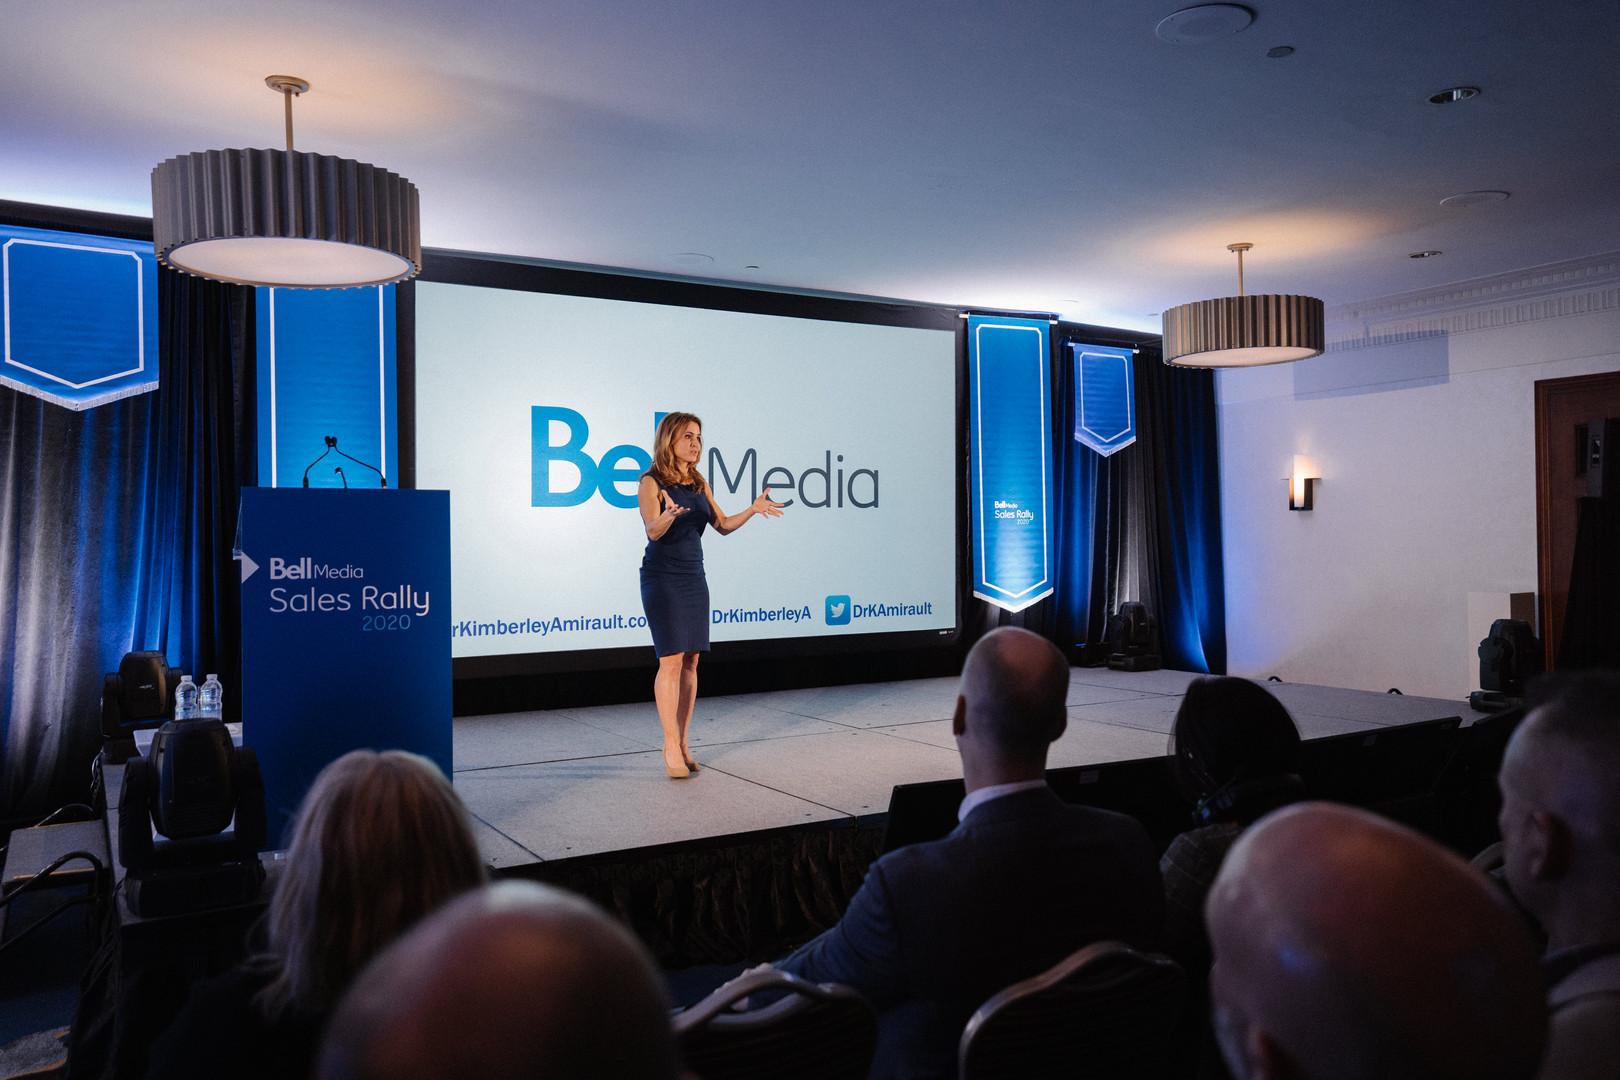 Bell Media Sales Rally